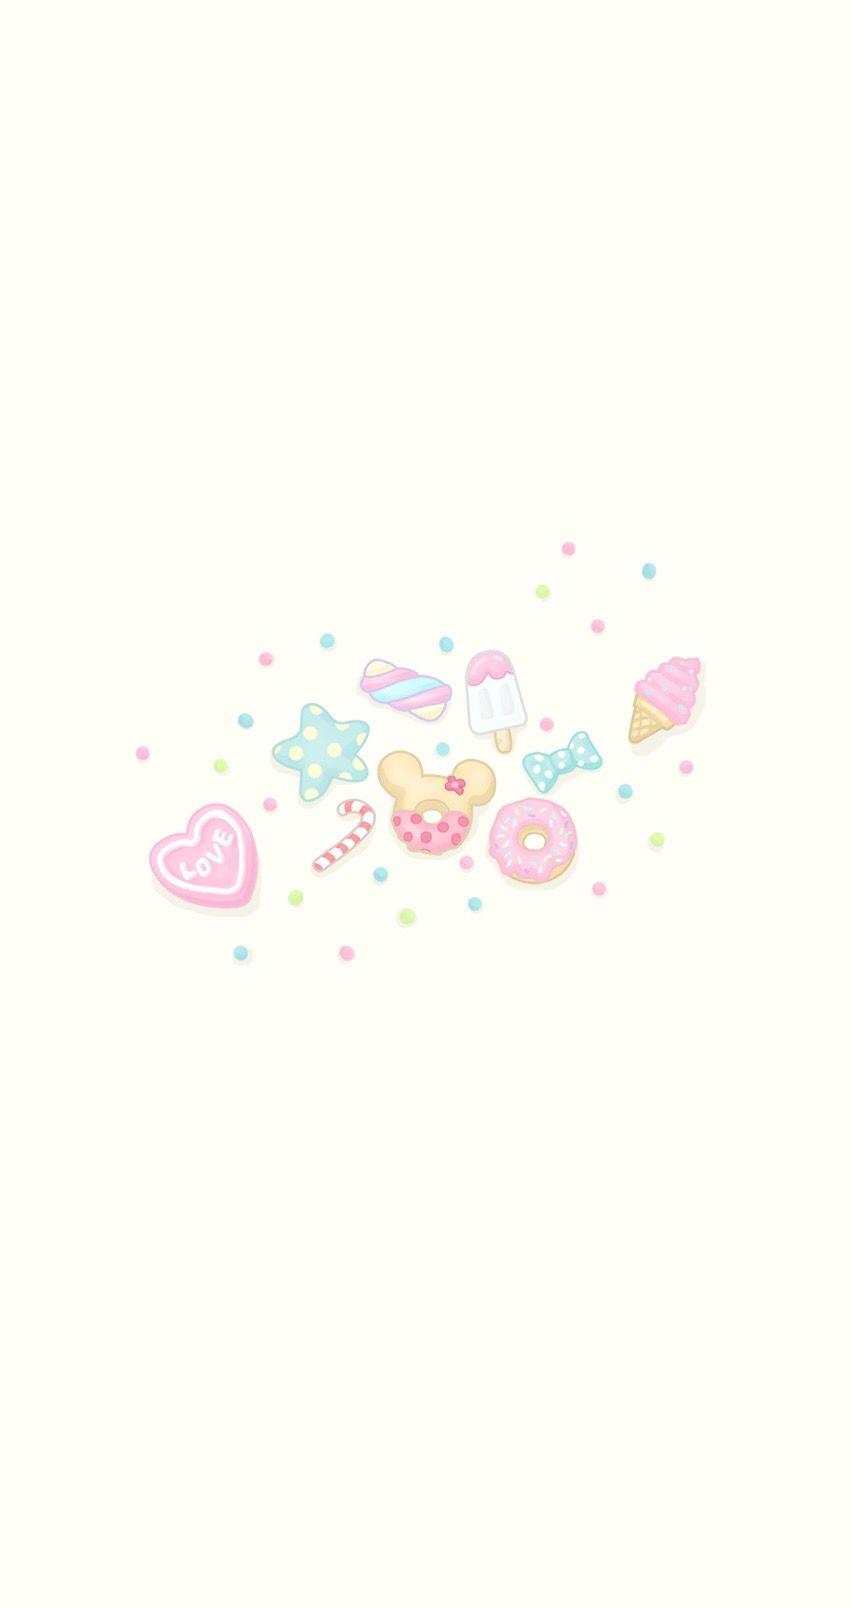 Sweets Wall Sanrio Wallpaper Cute Baby Wallpaper Cupcakes